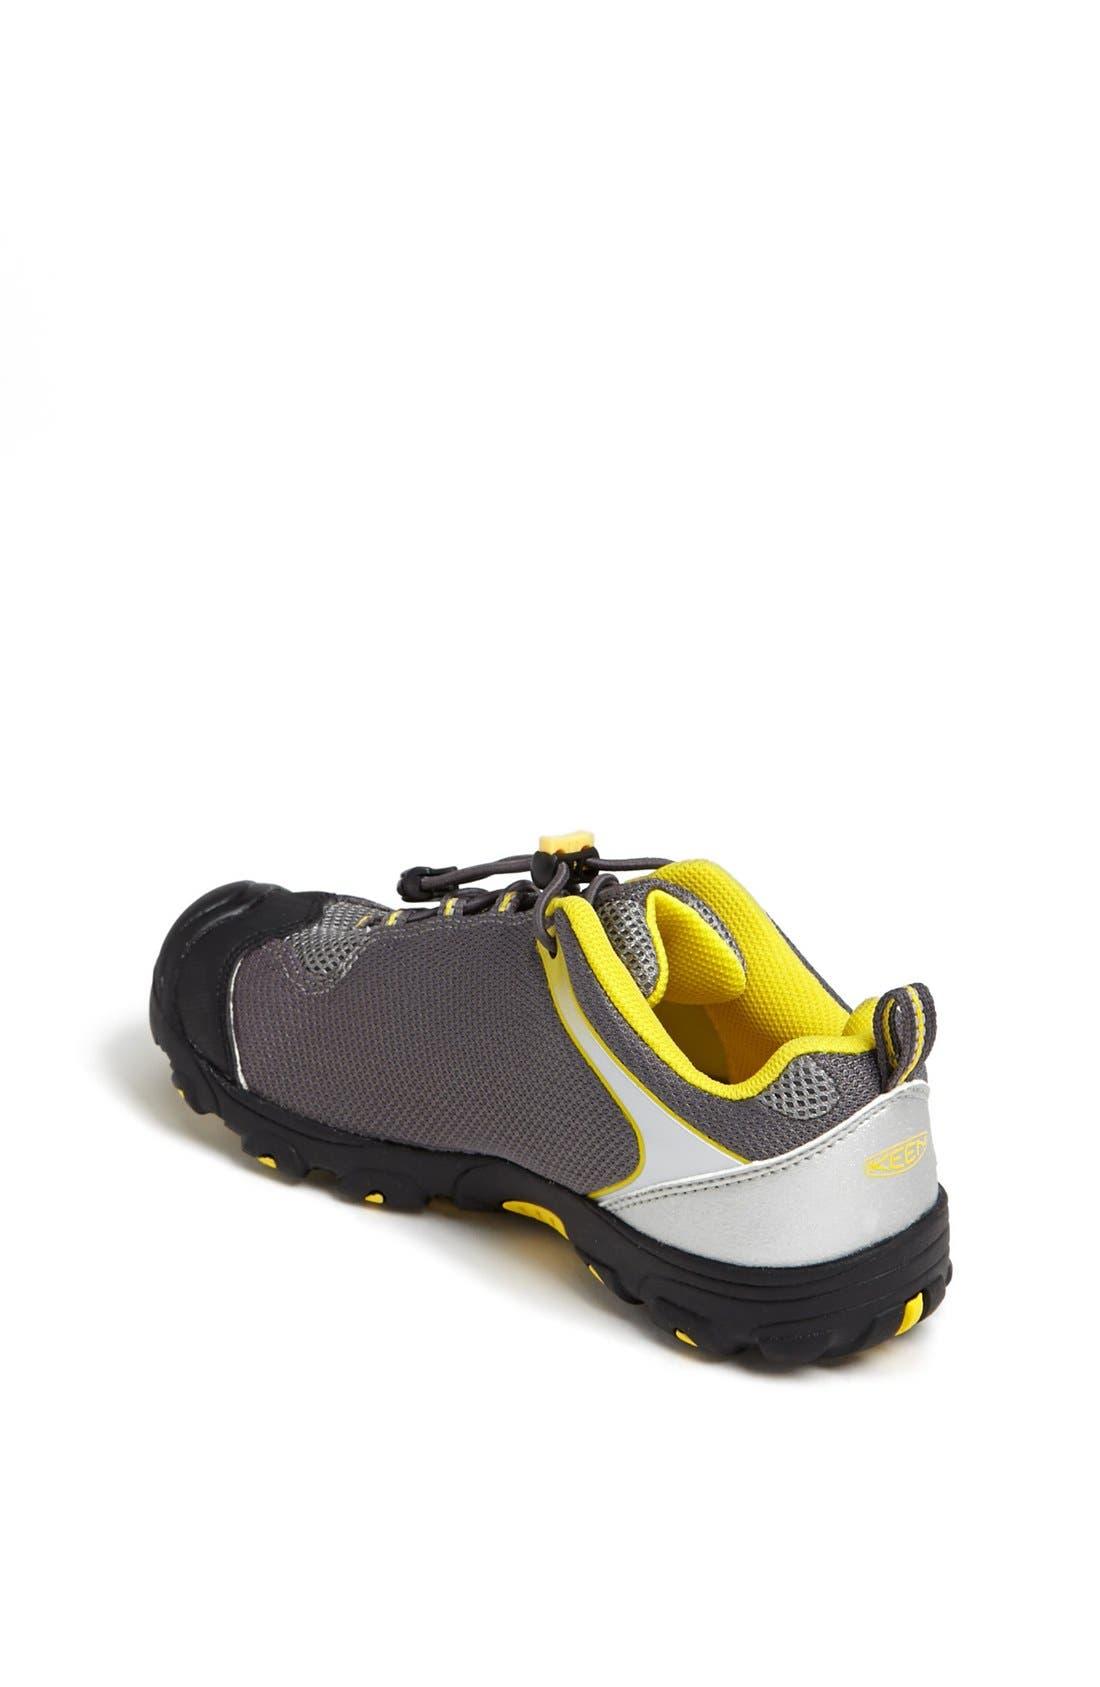 Alternate Image 2  - Keen 'Jamison' Sneaker (Toddler, Little Kid & Big Kid)